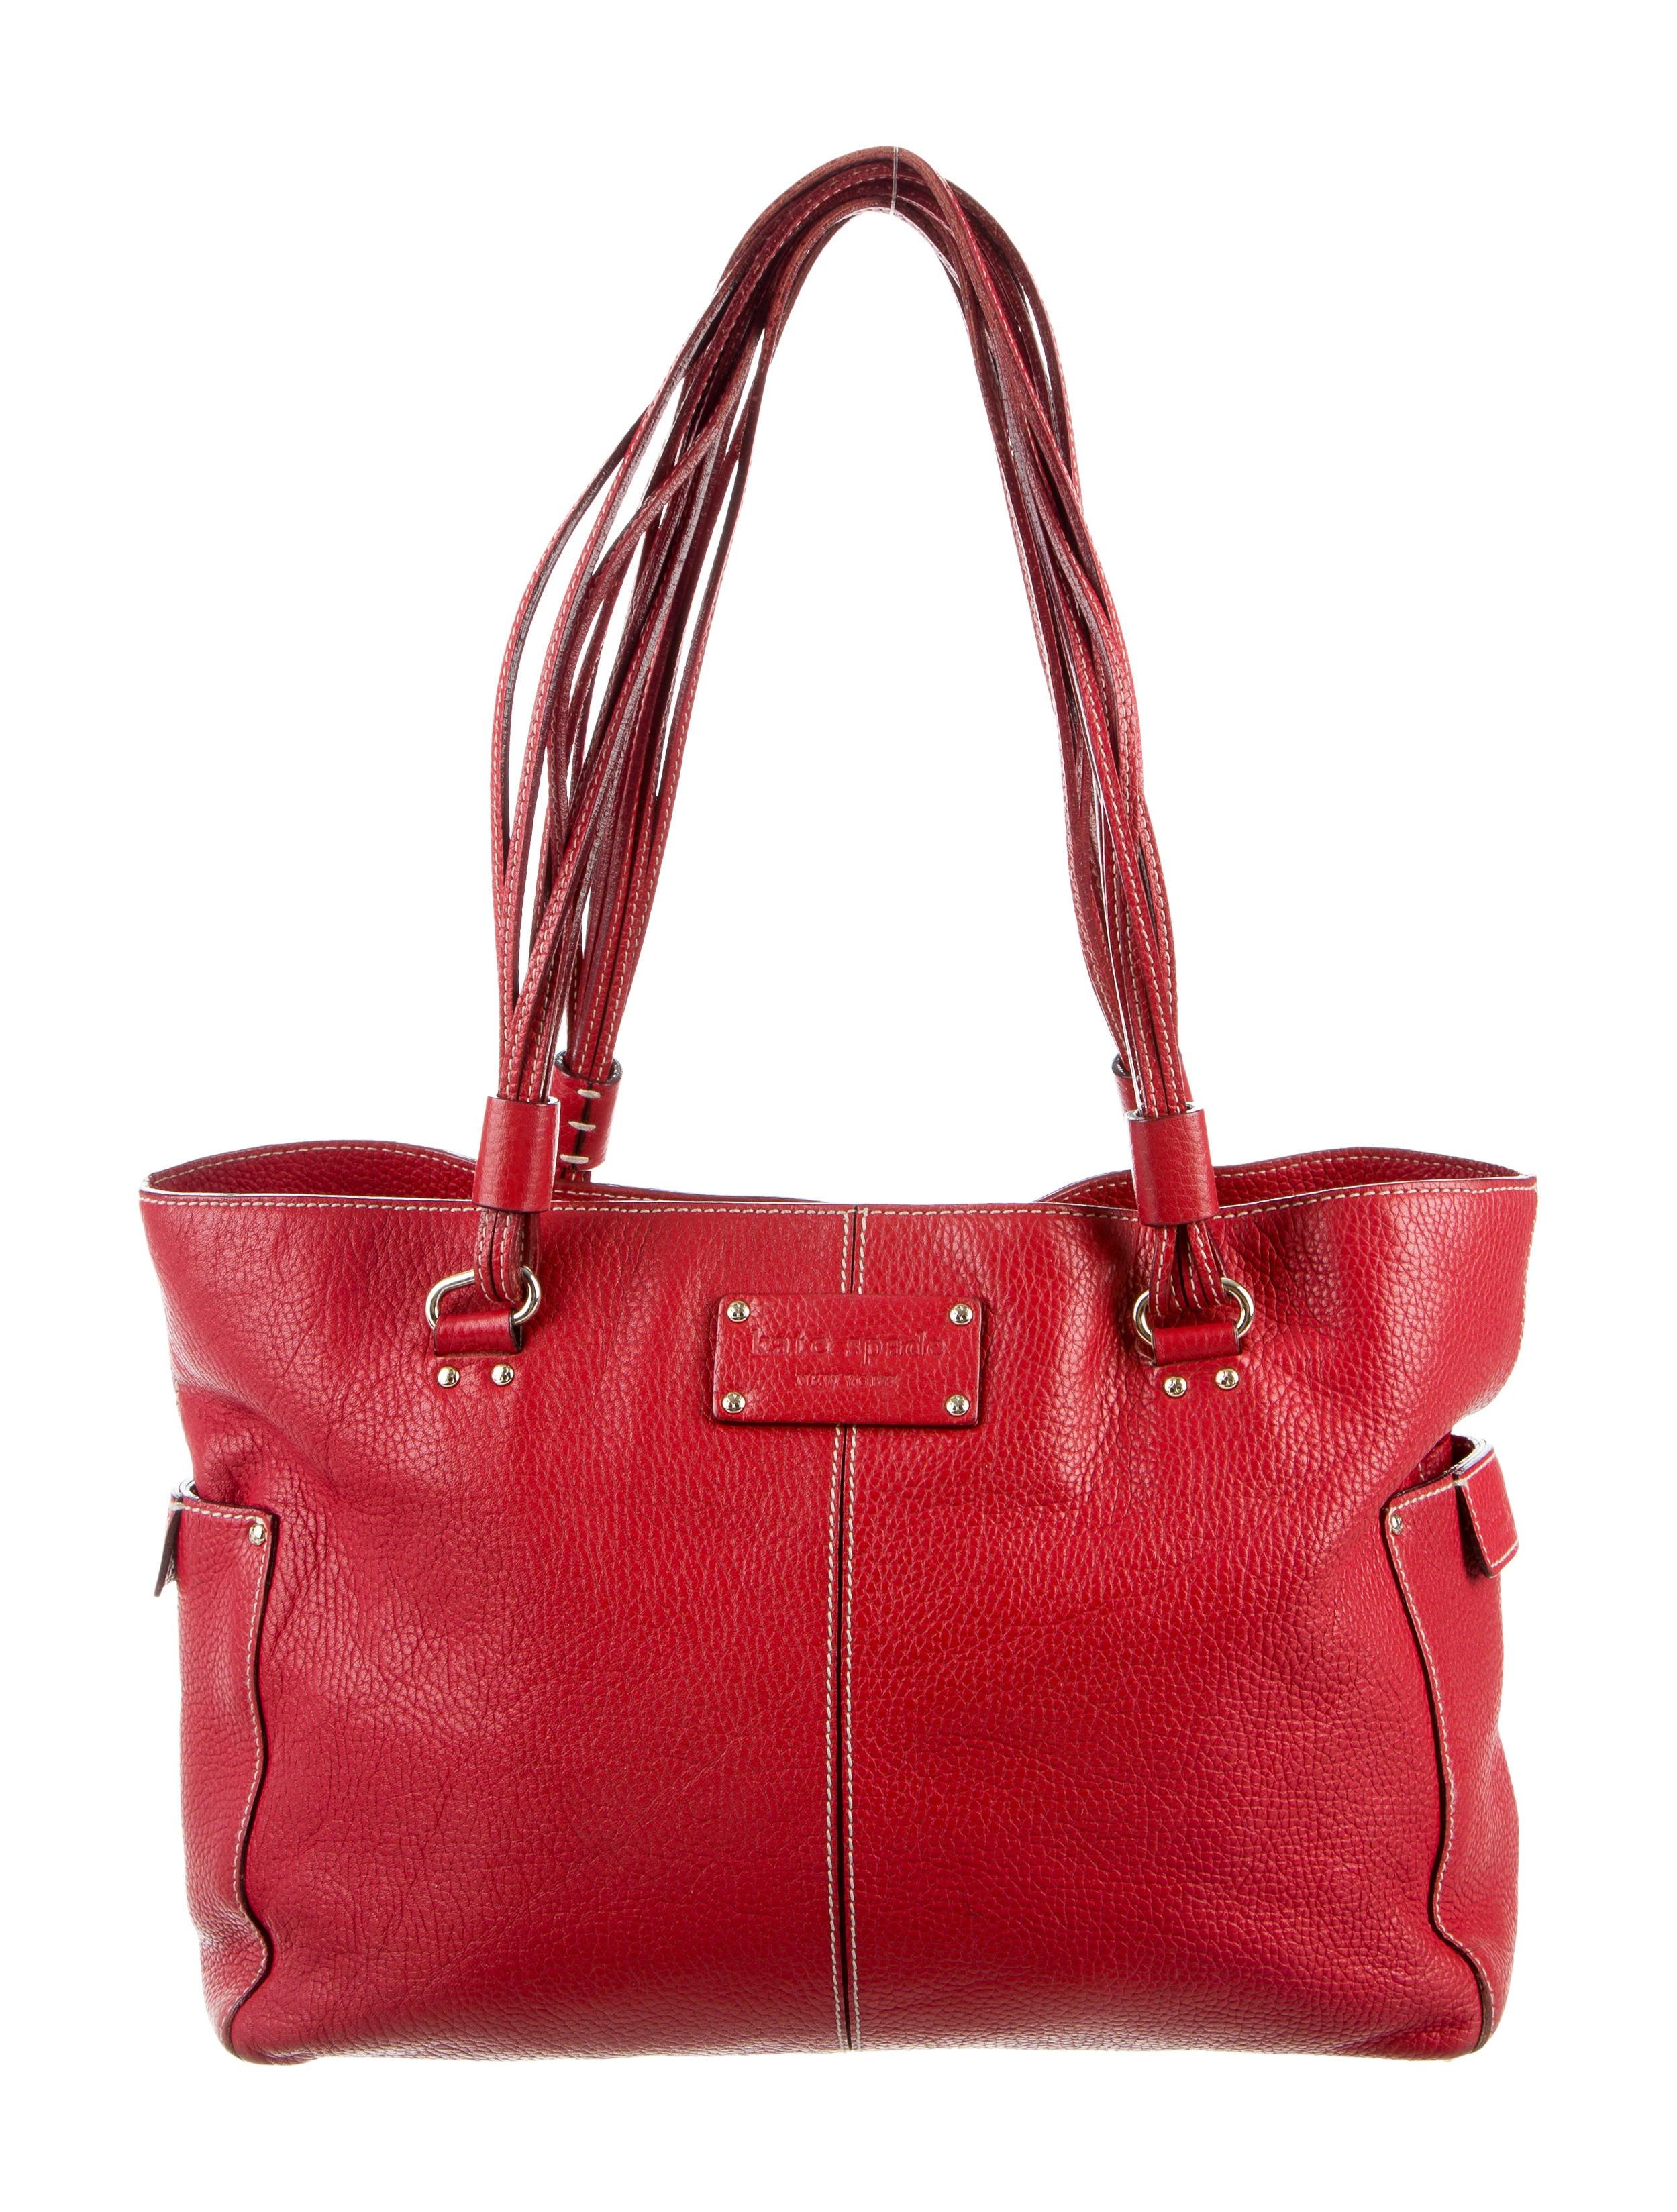 Kate Spade New York Leather Tote Bag Handbags Wka54727